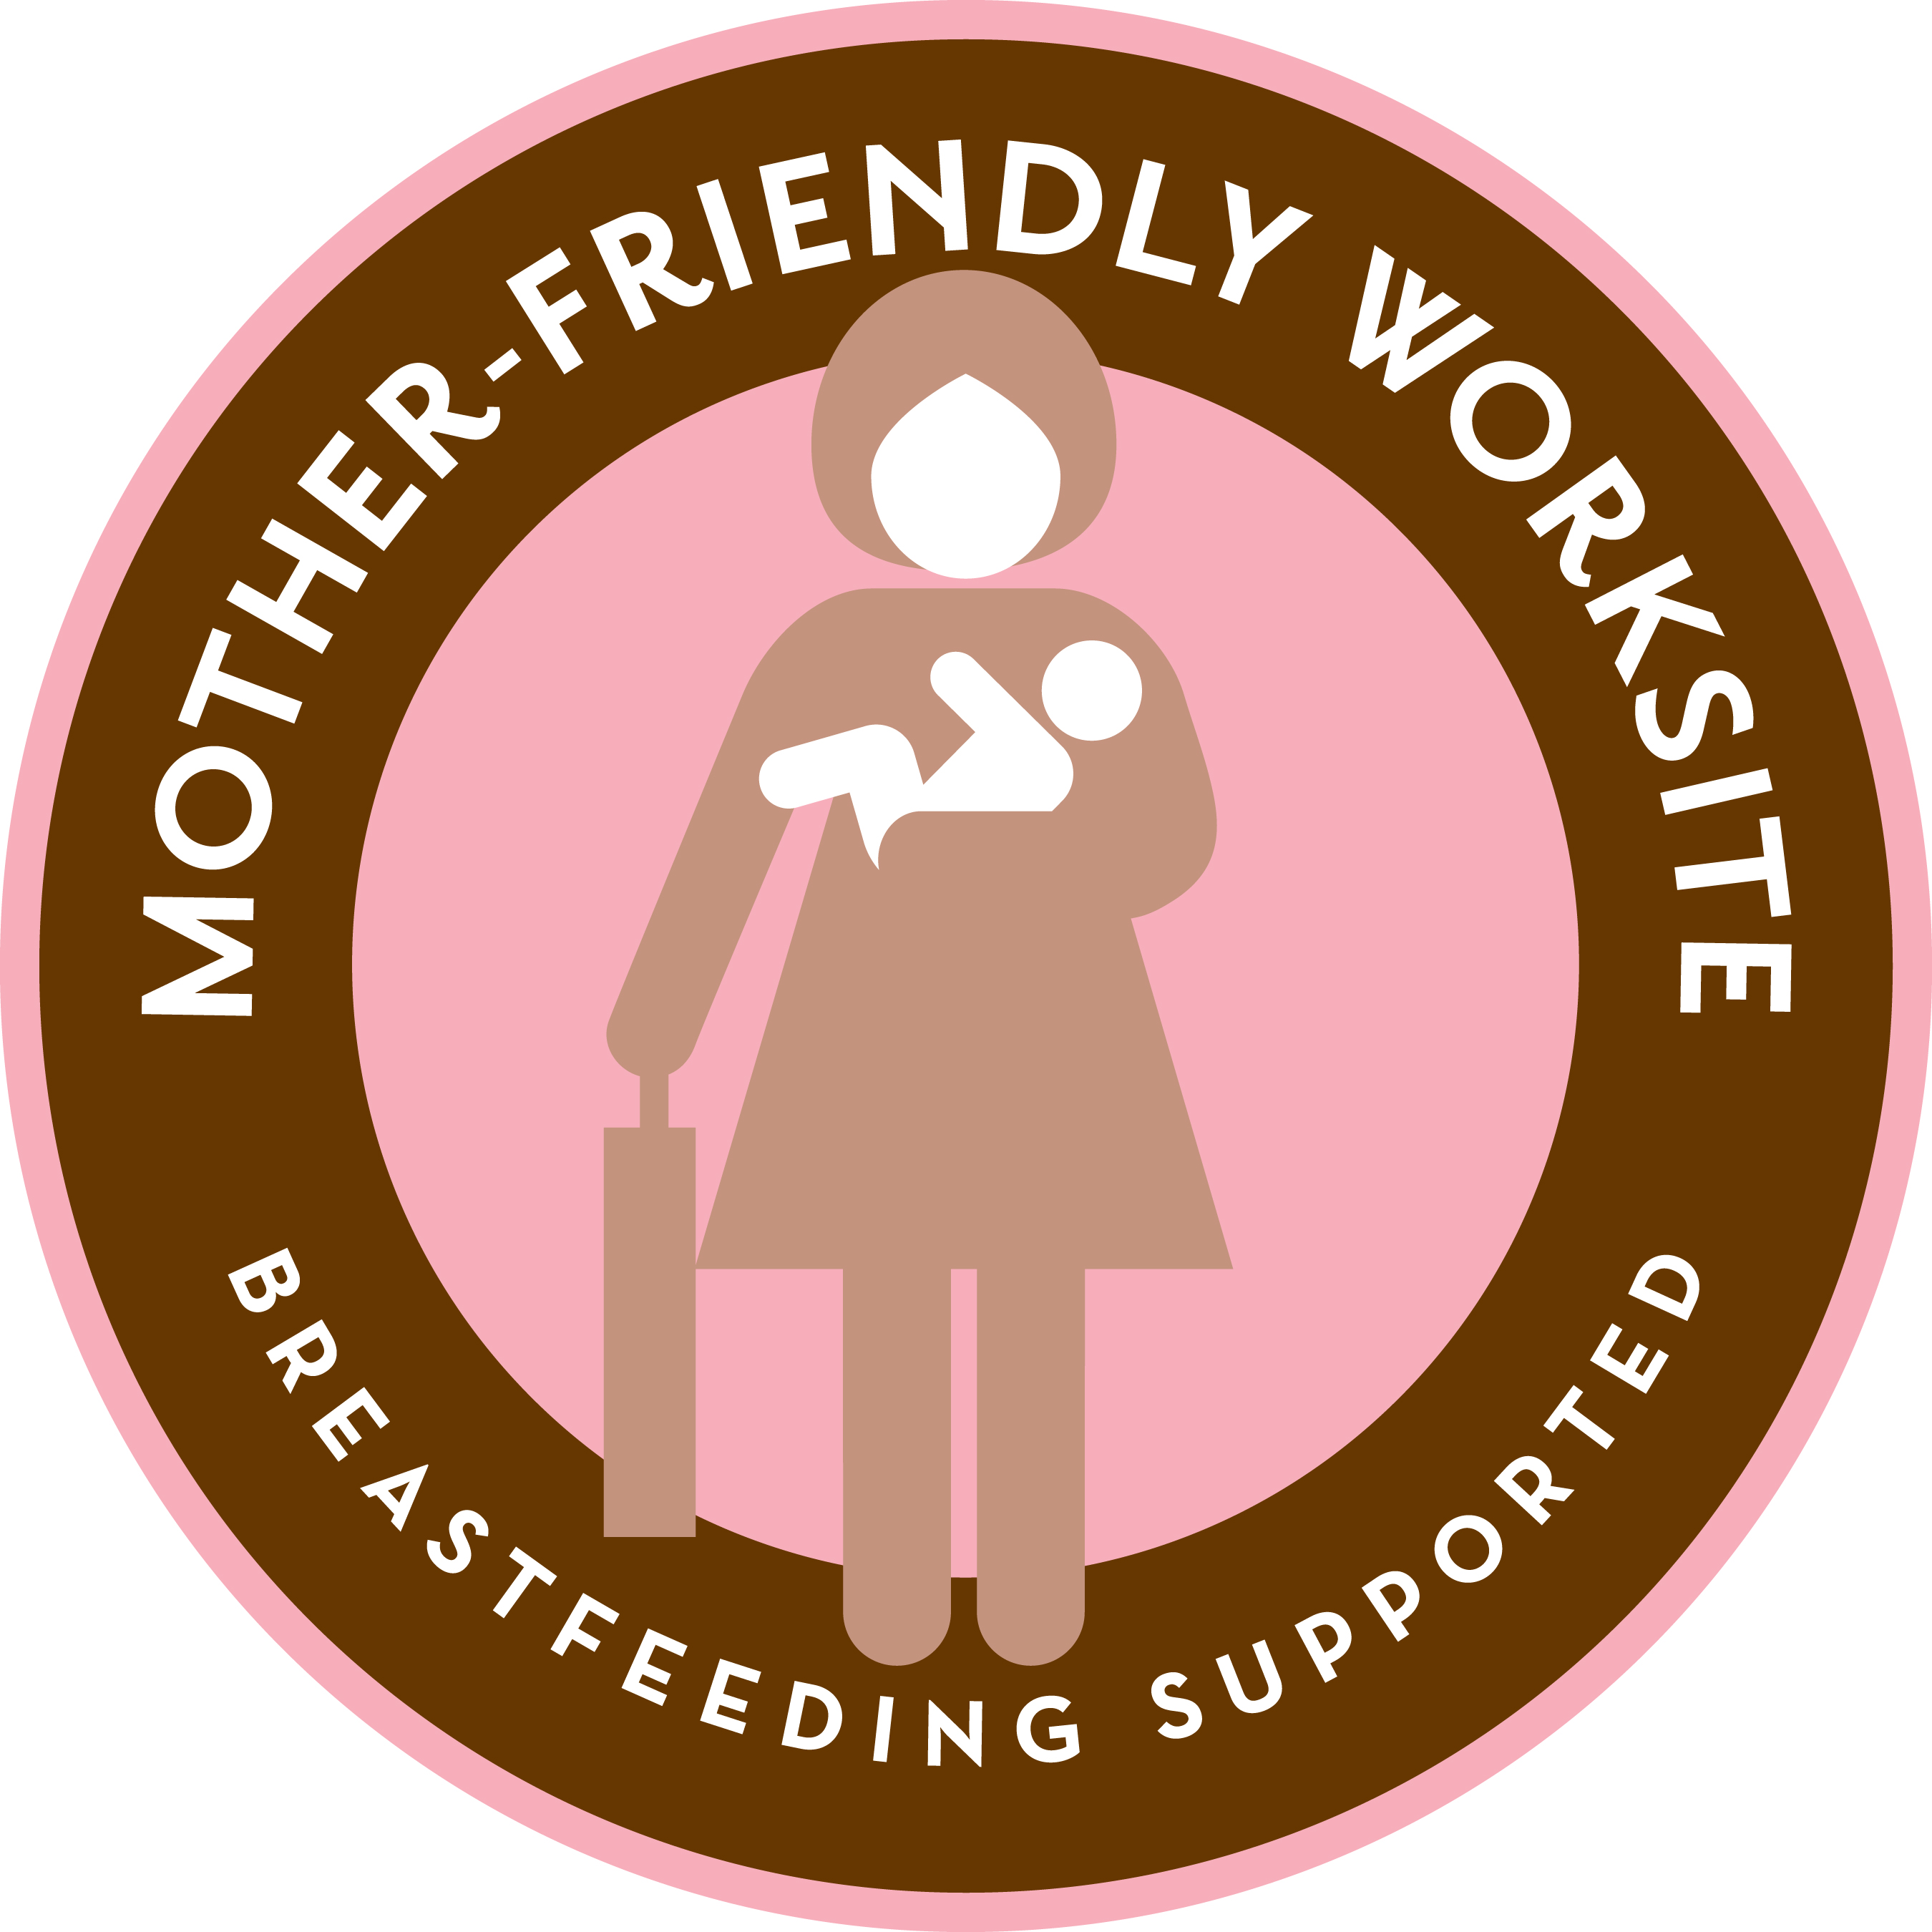 Mother-Friendly Designation